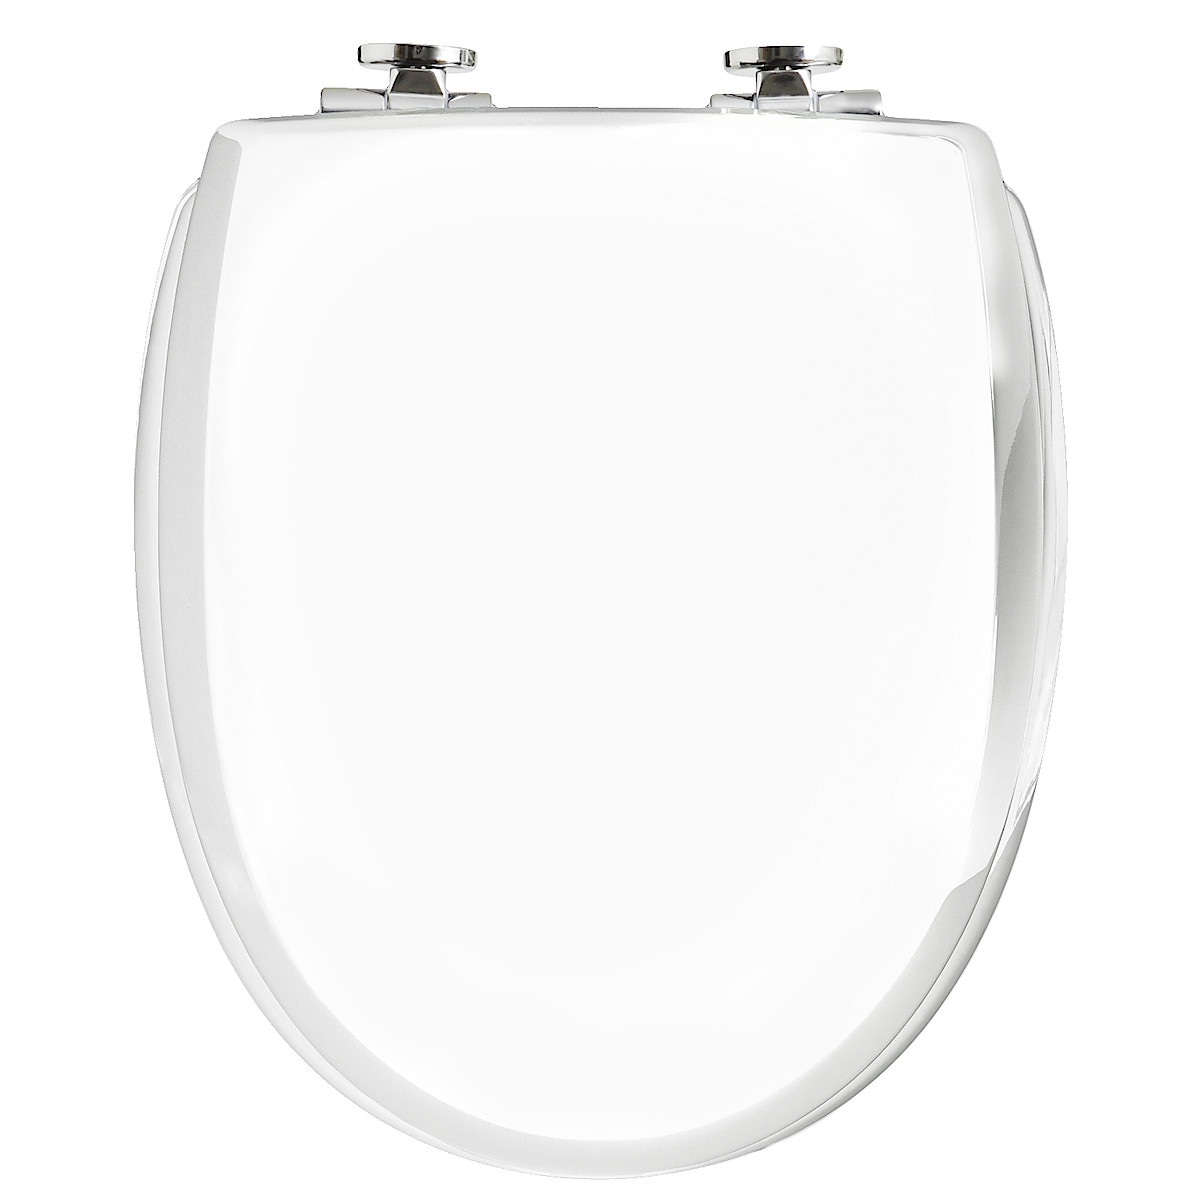 Toalettsits Kan 3001 Exclusive